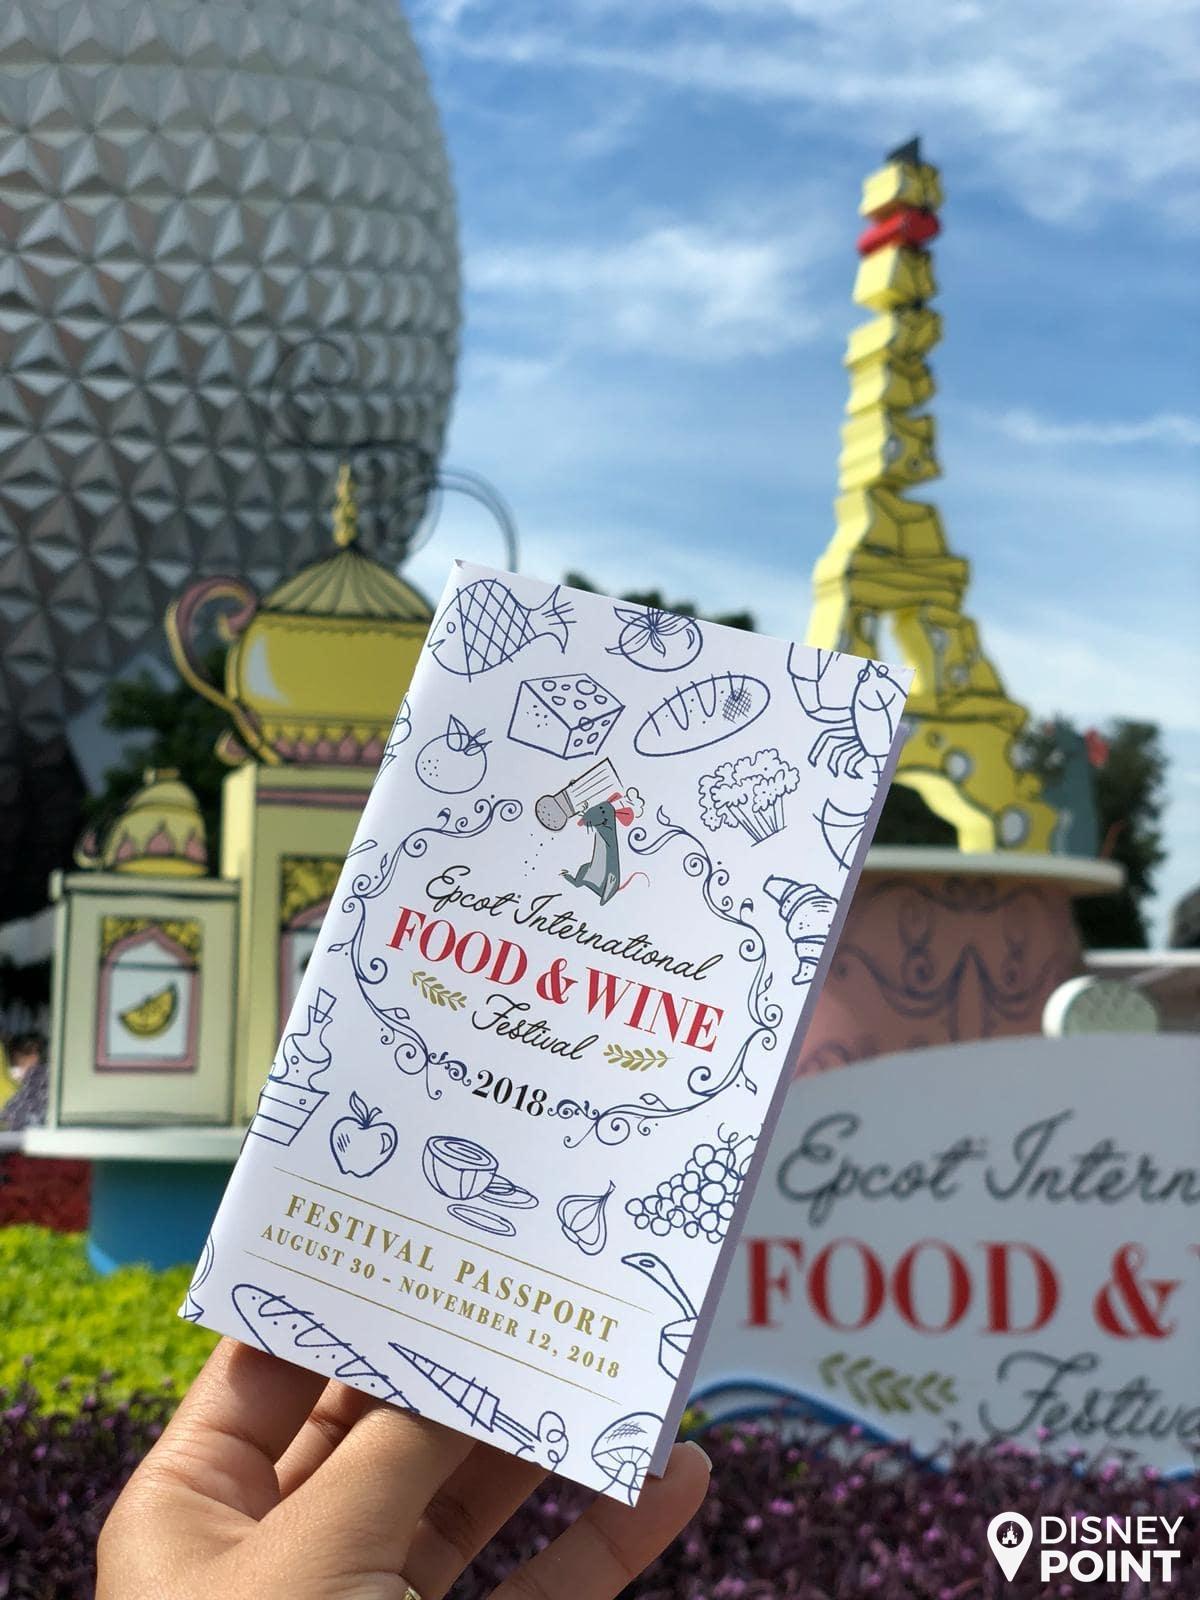 Guia completo epcot international food wine festival 2018 disney point epcot food wine passaporte fandeluxe Images